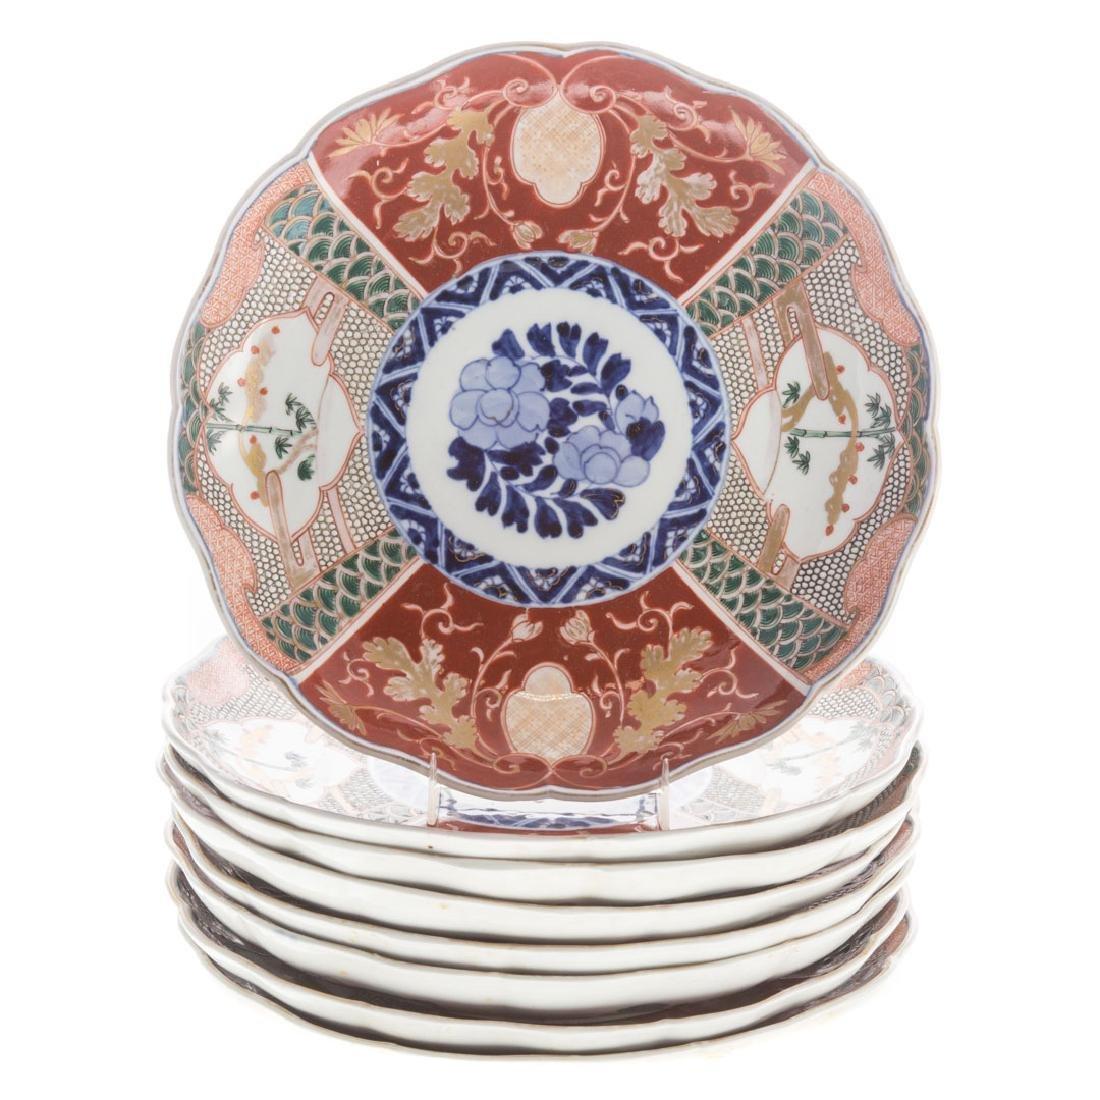 Eight Japanese Imari porcelain plates